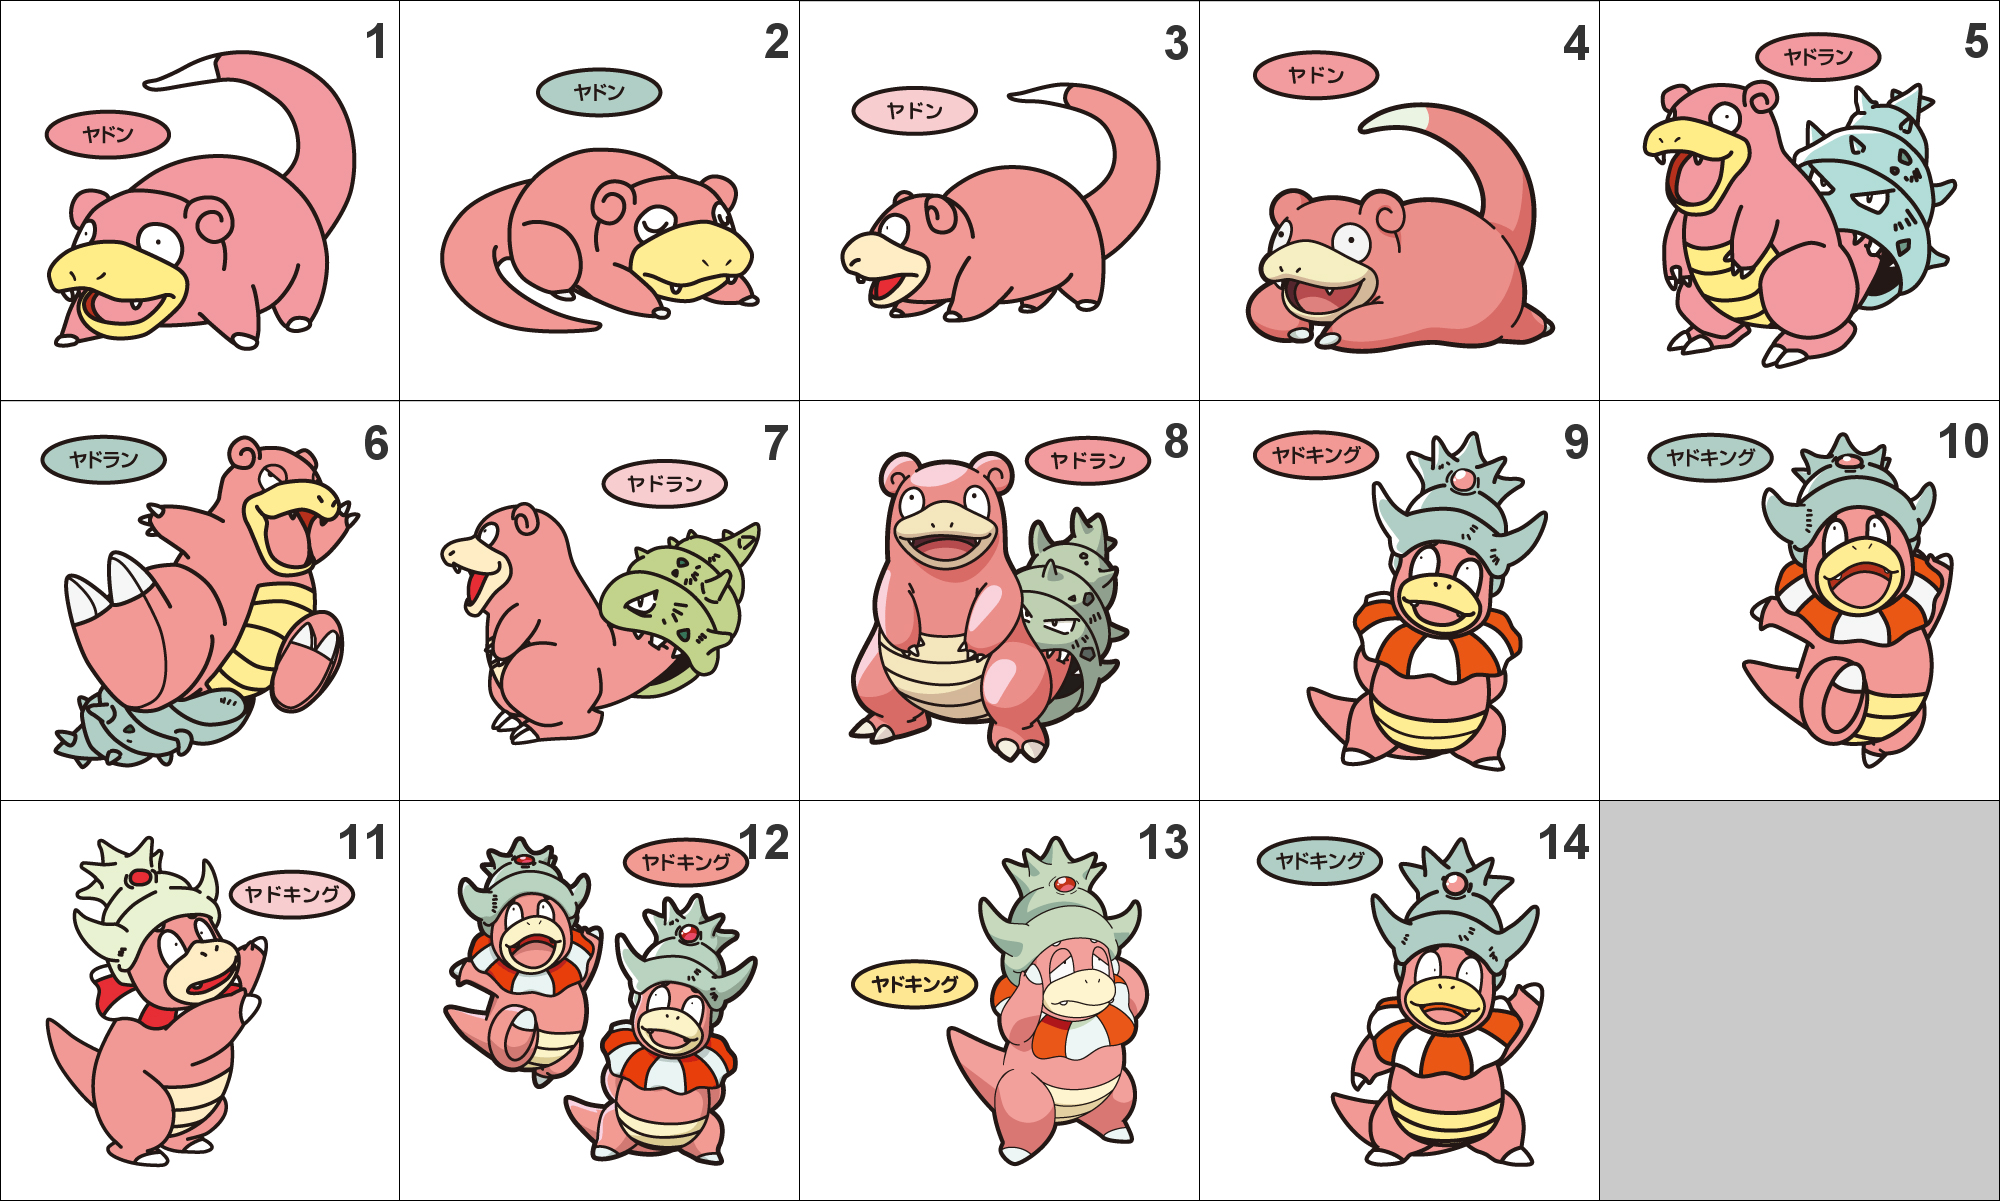 Slowbro Images | Pokemon Images